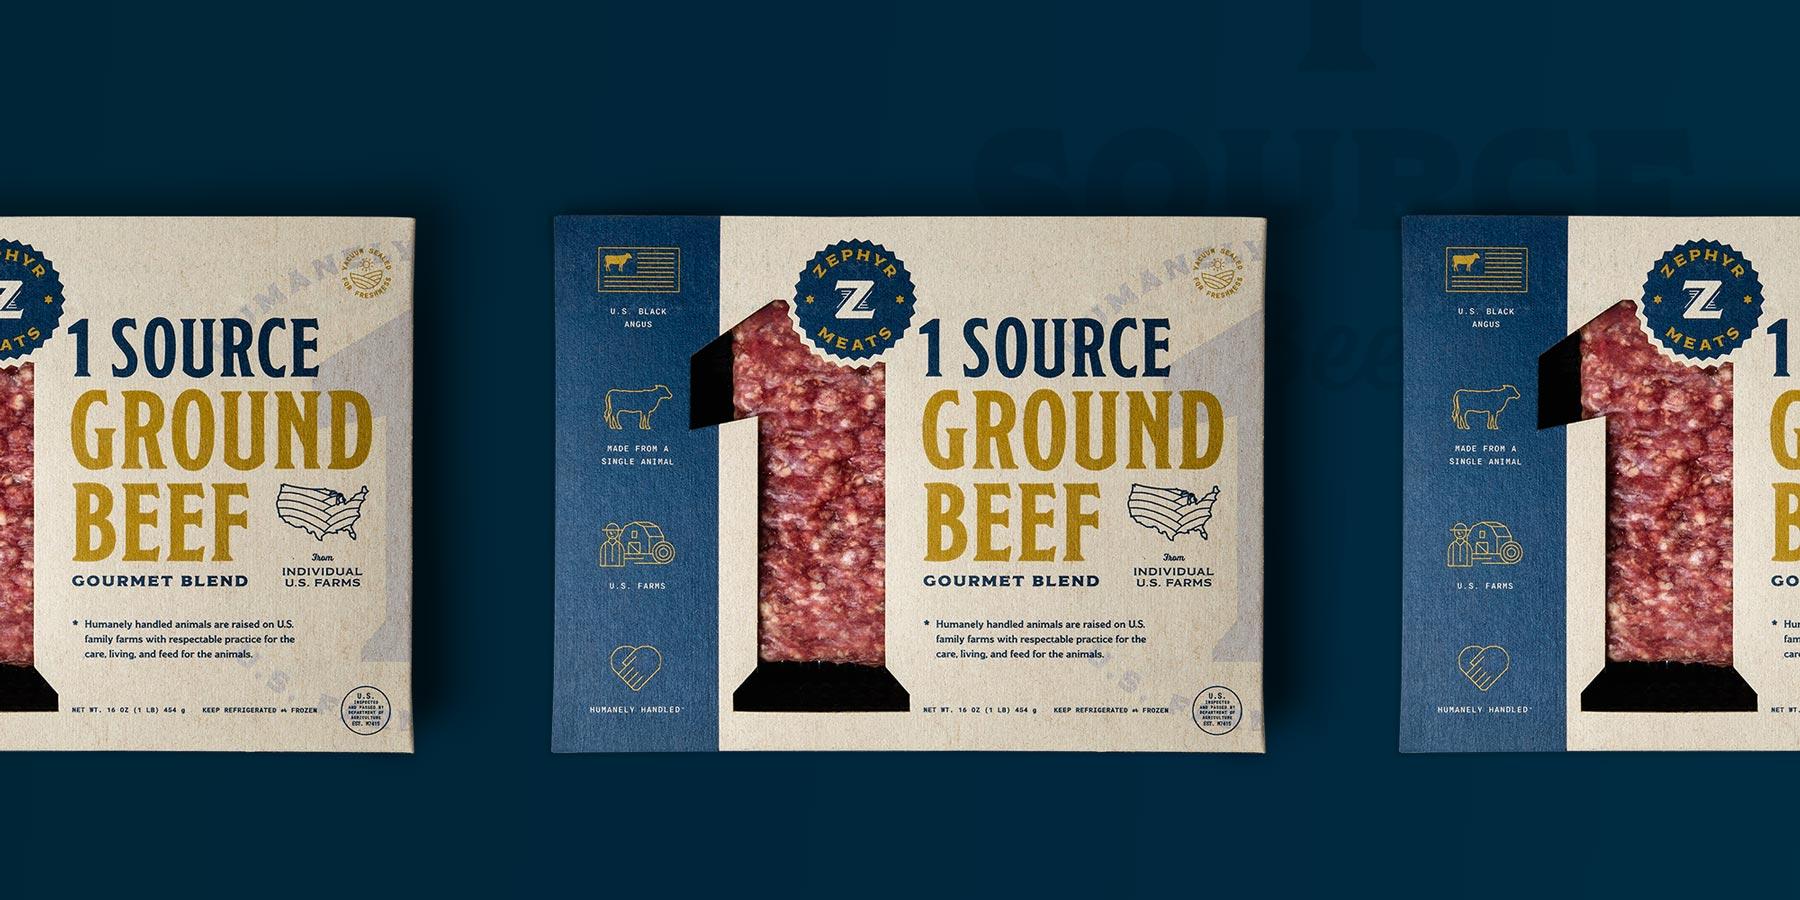 1 source ground beef box